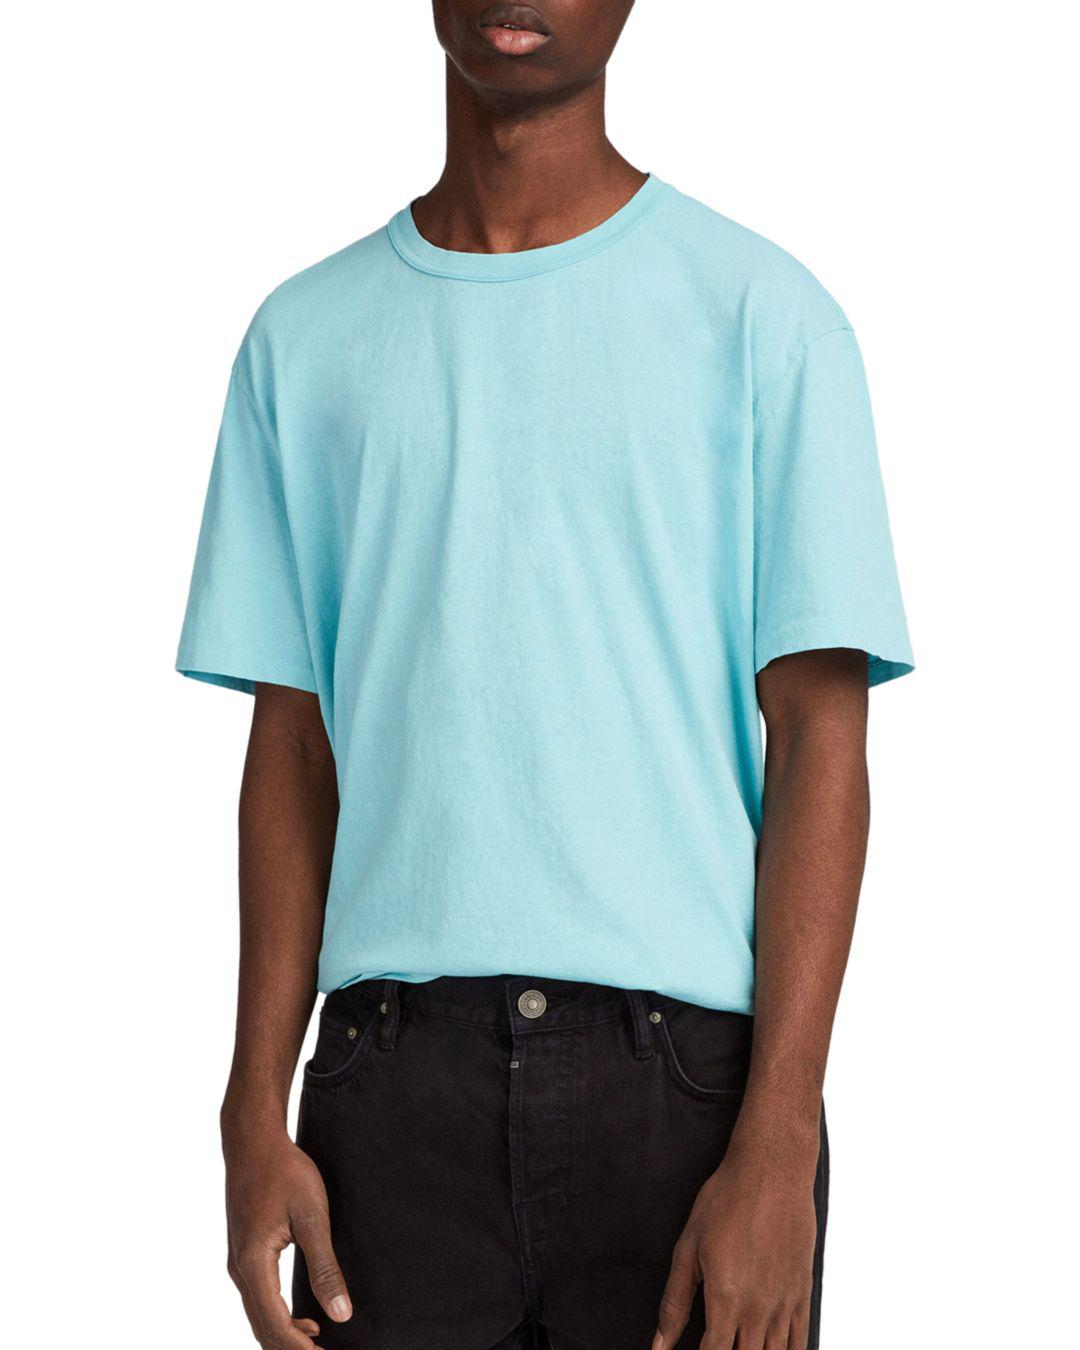 AllSaints Interger Tee in Blue for Men